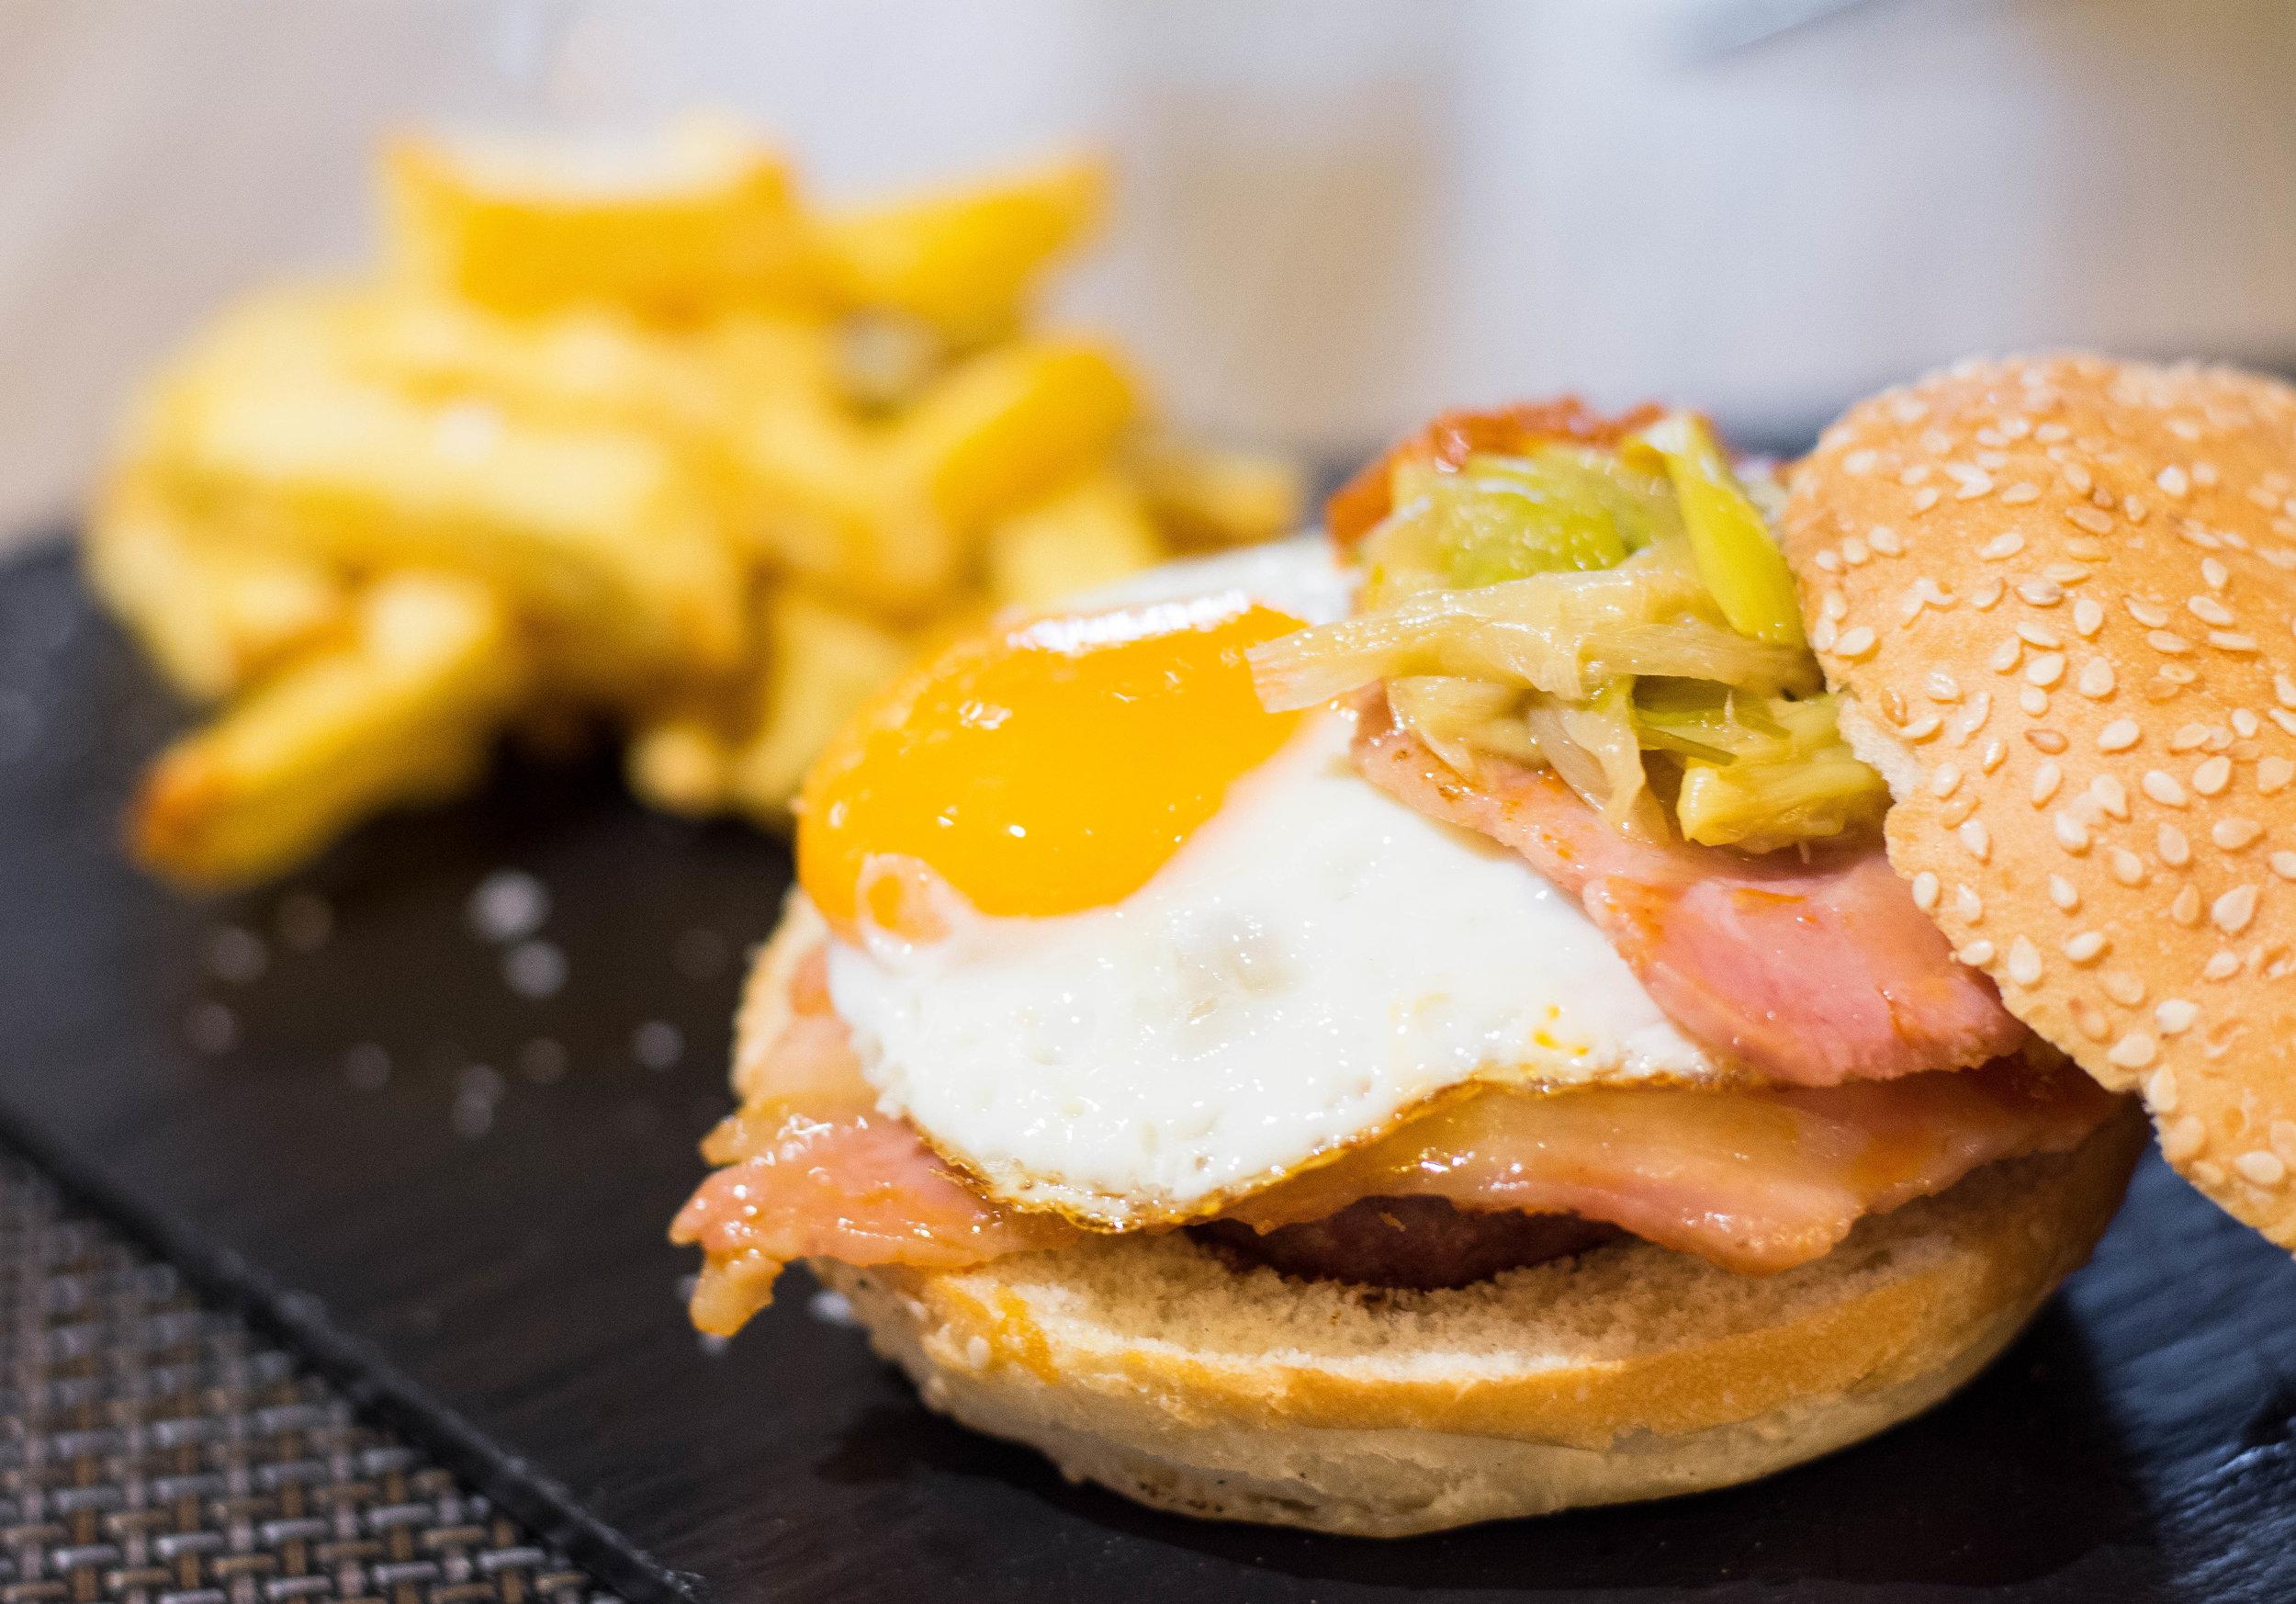 Burger at Le Sense, made with matured meat, calçots and romesco